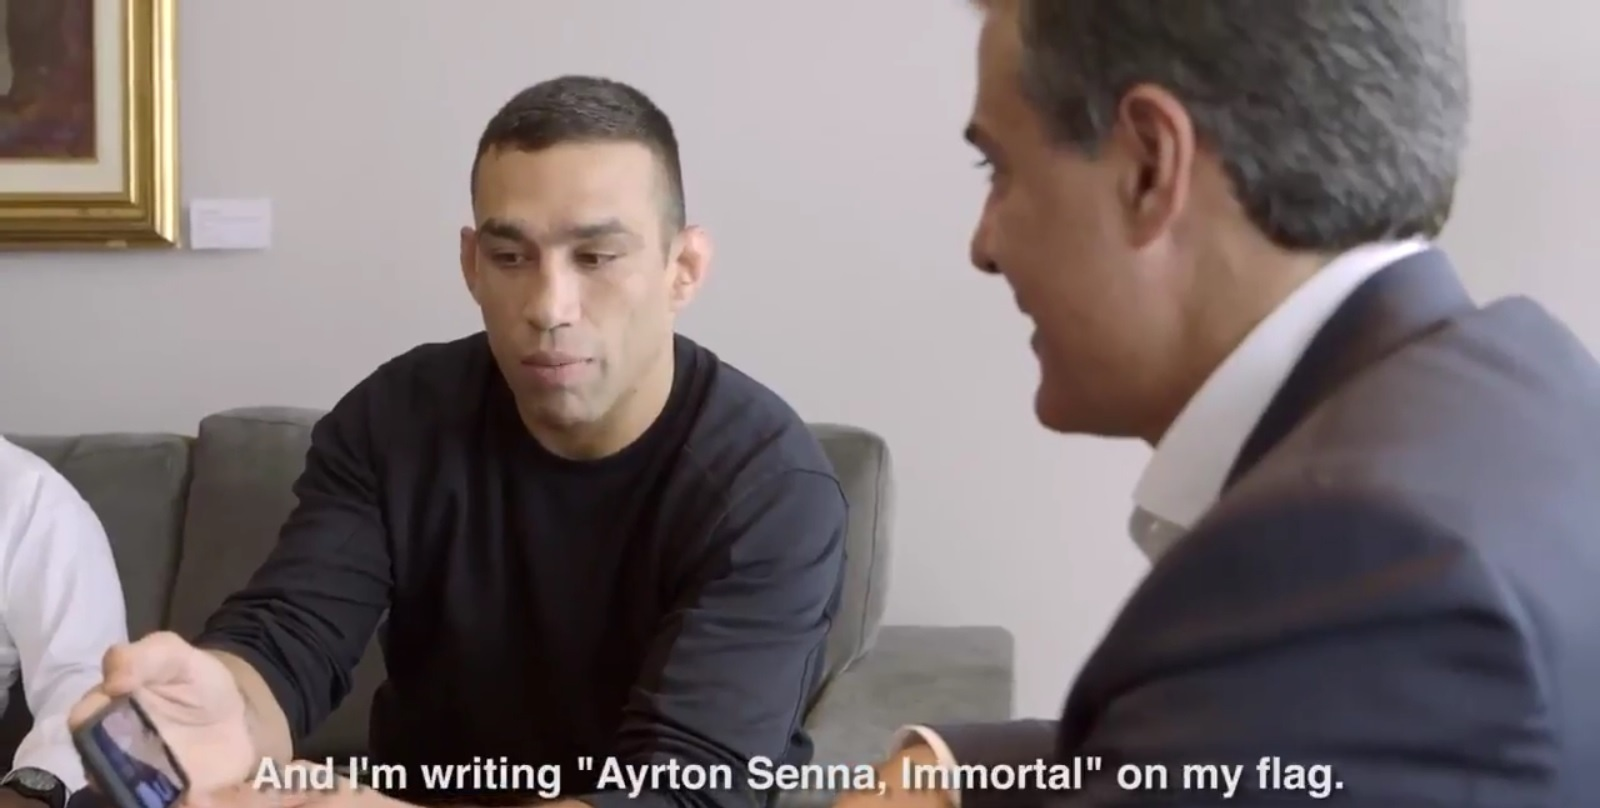 Werdum homenageará Ayrton Senna no UFC 198